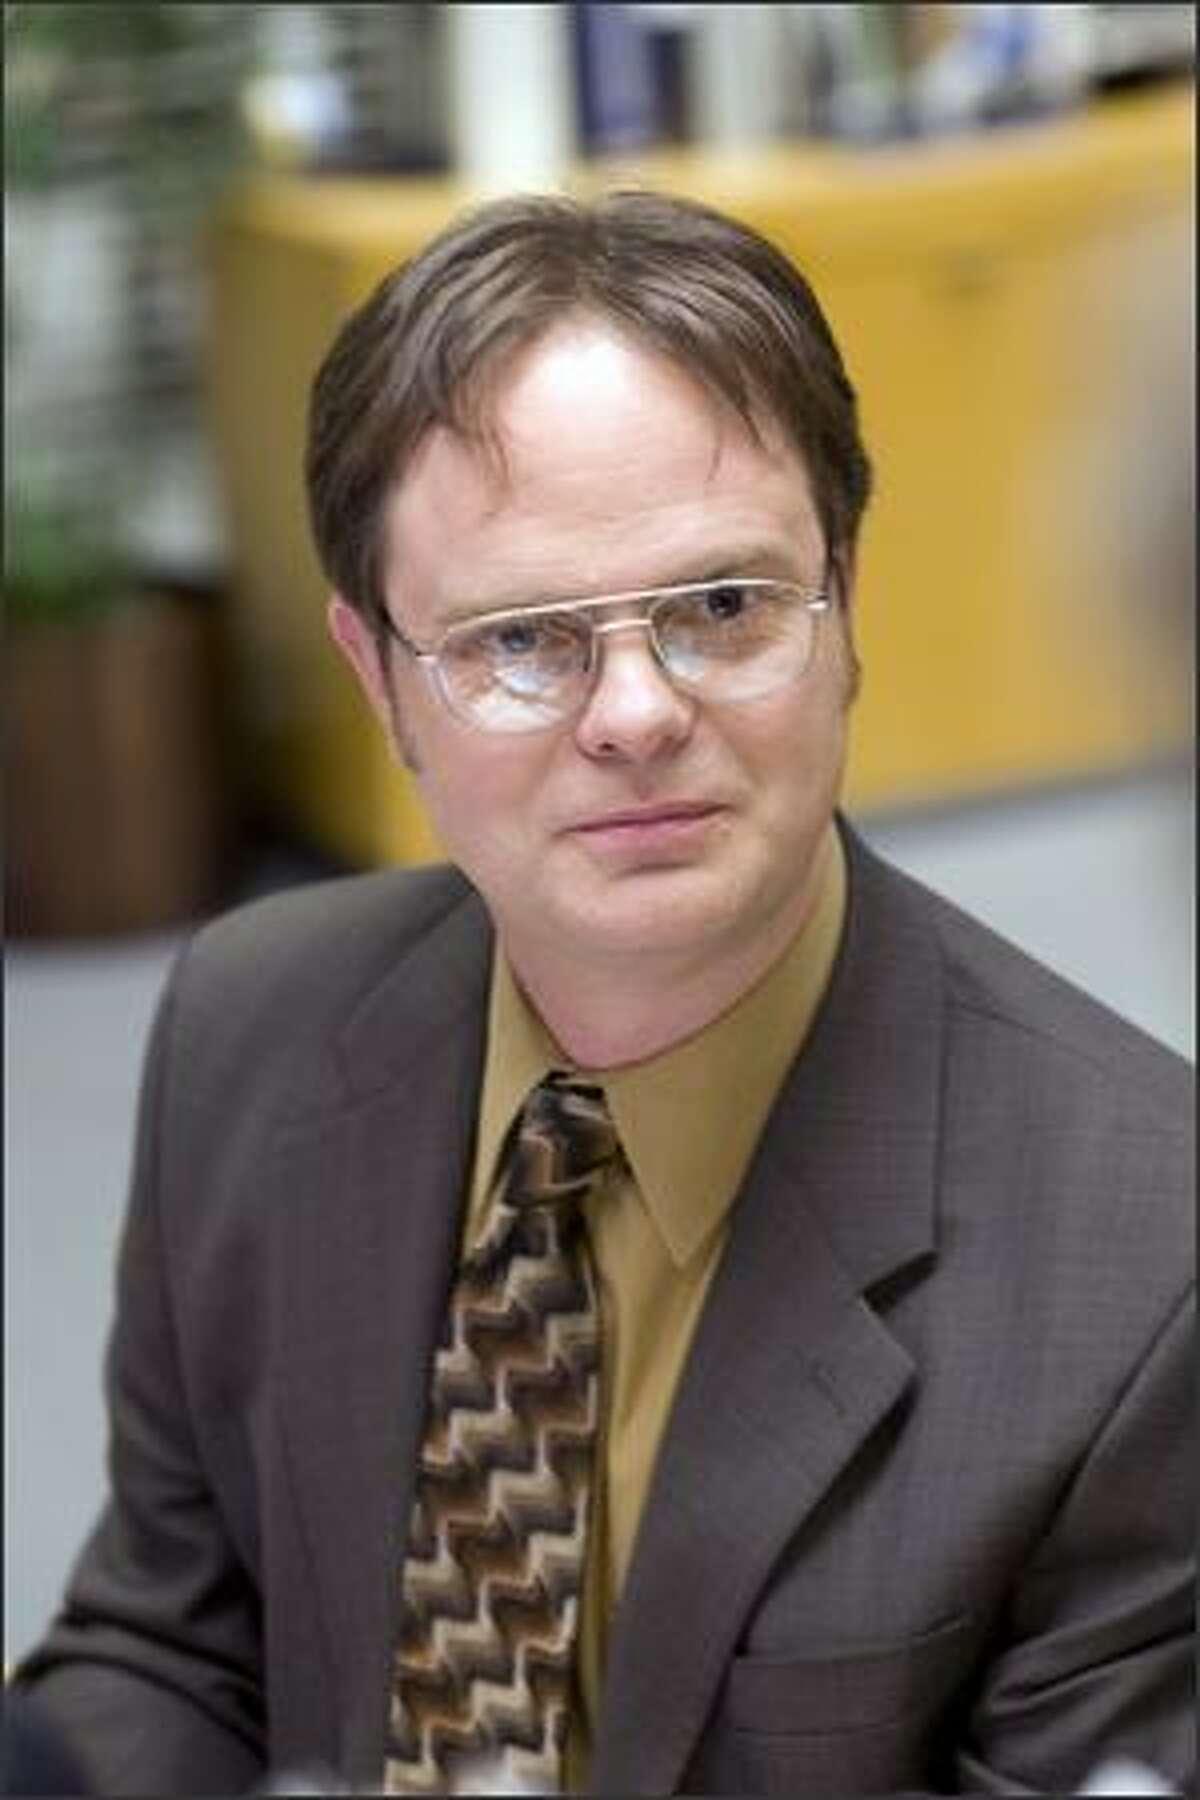 Rainn Wilson as Dwight Schrute in